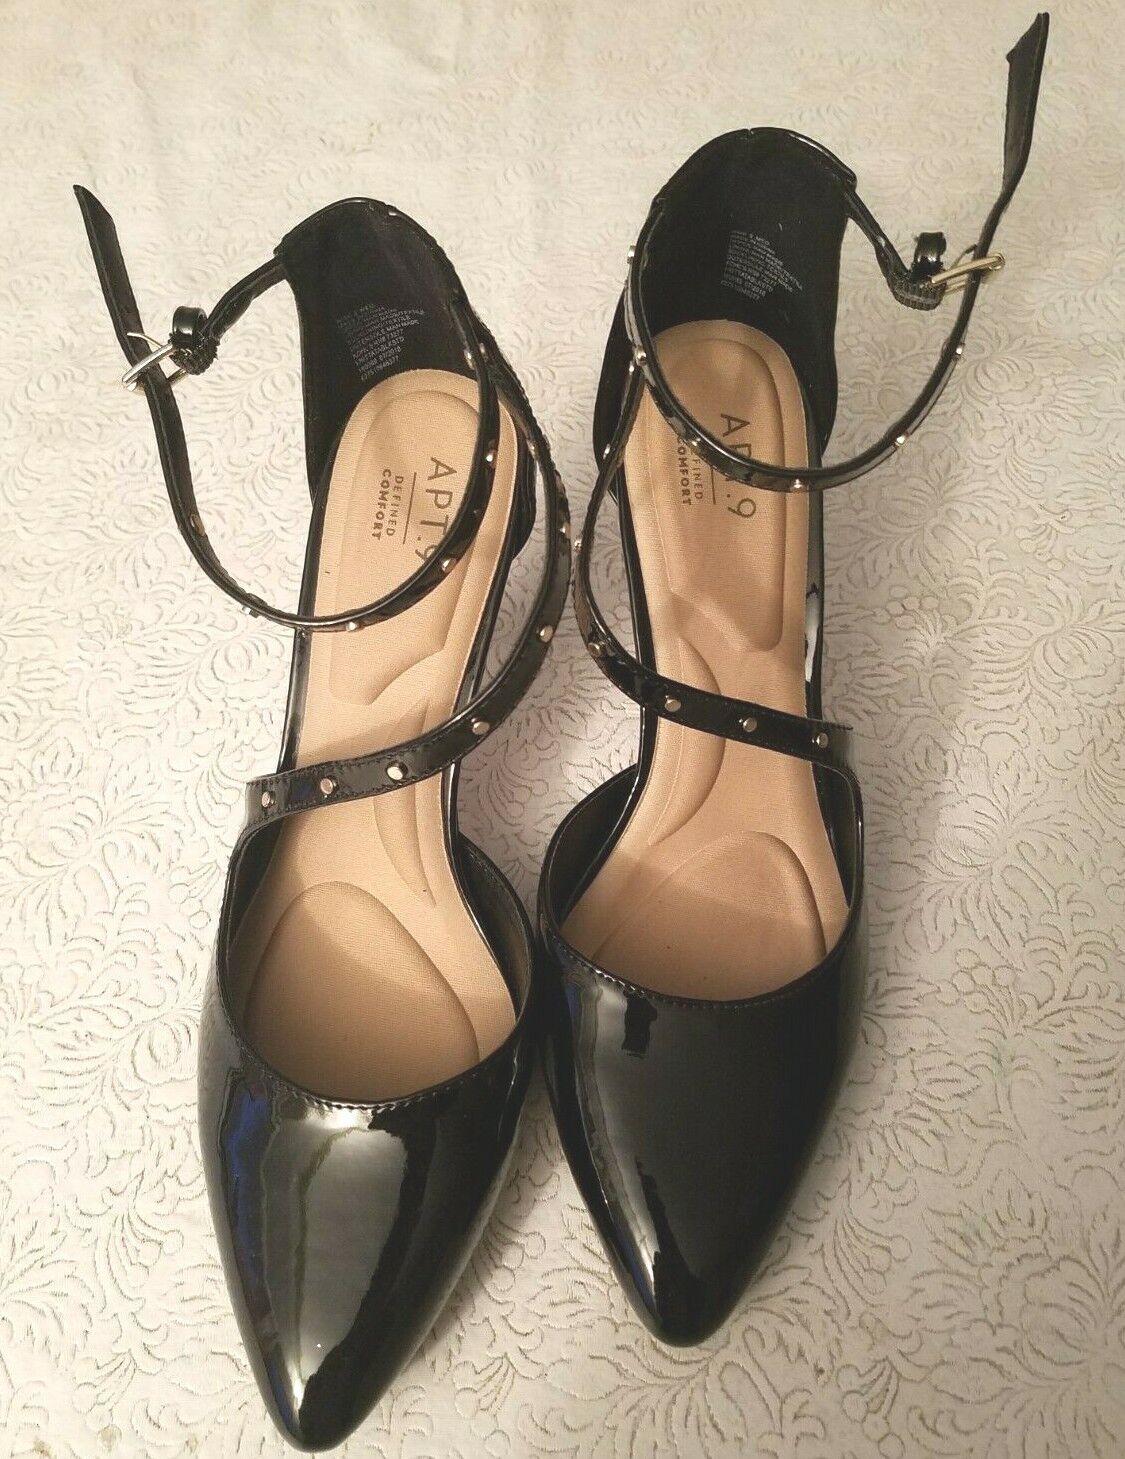 Apt 9 Womens High Heel - Pointed Toe Shoe- Black Patent Leather Sz 9